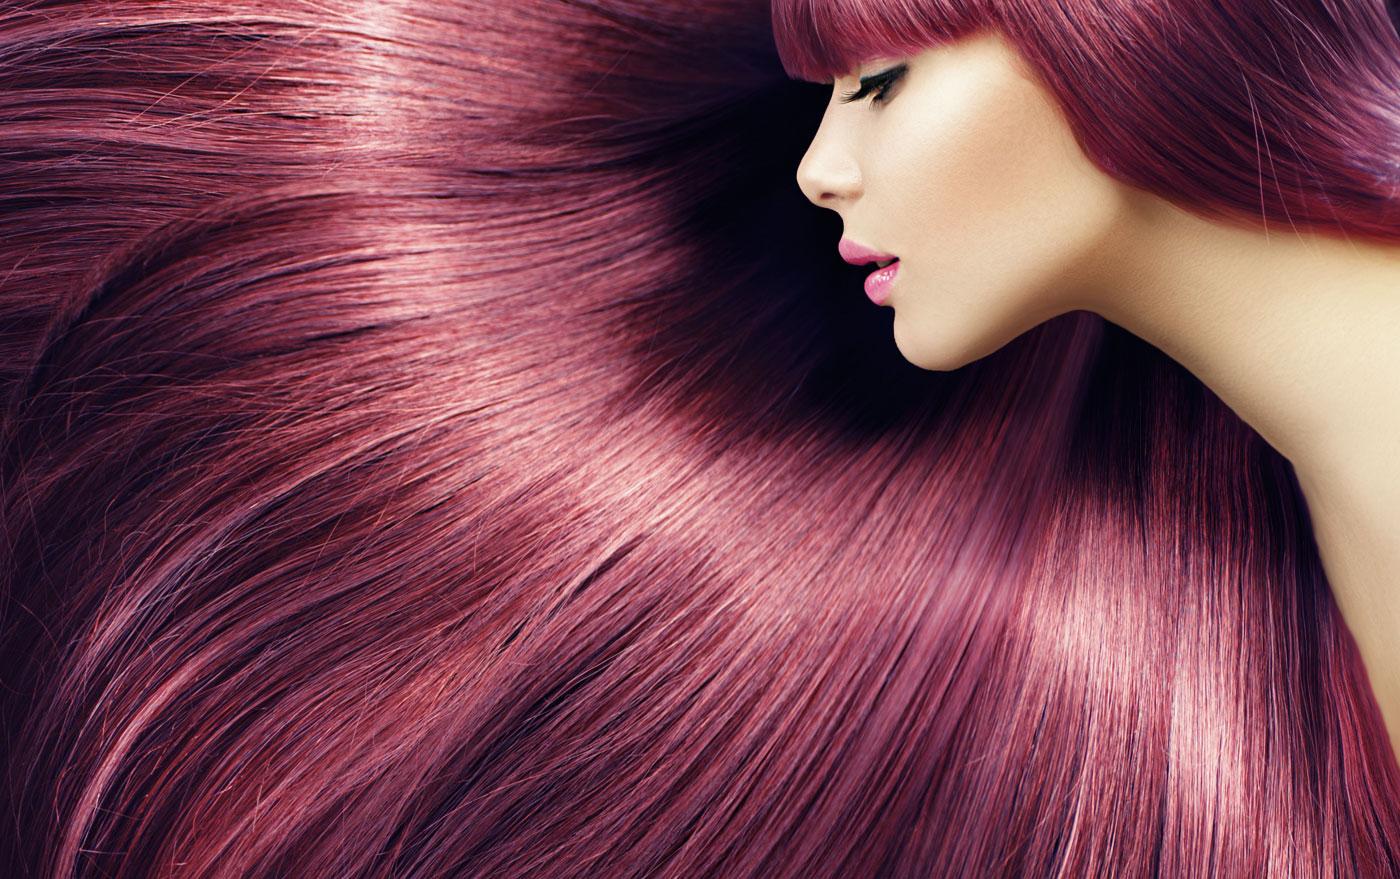 Kim Sun Young Hair Salon Palisades Park Nj Top Quality